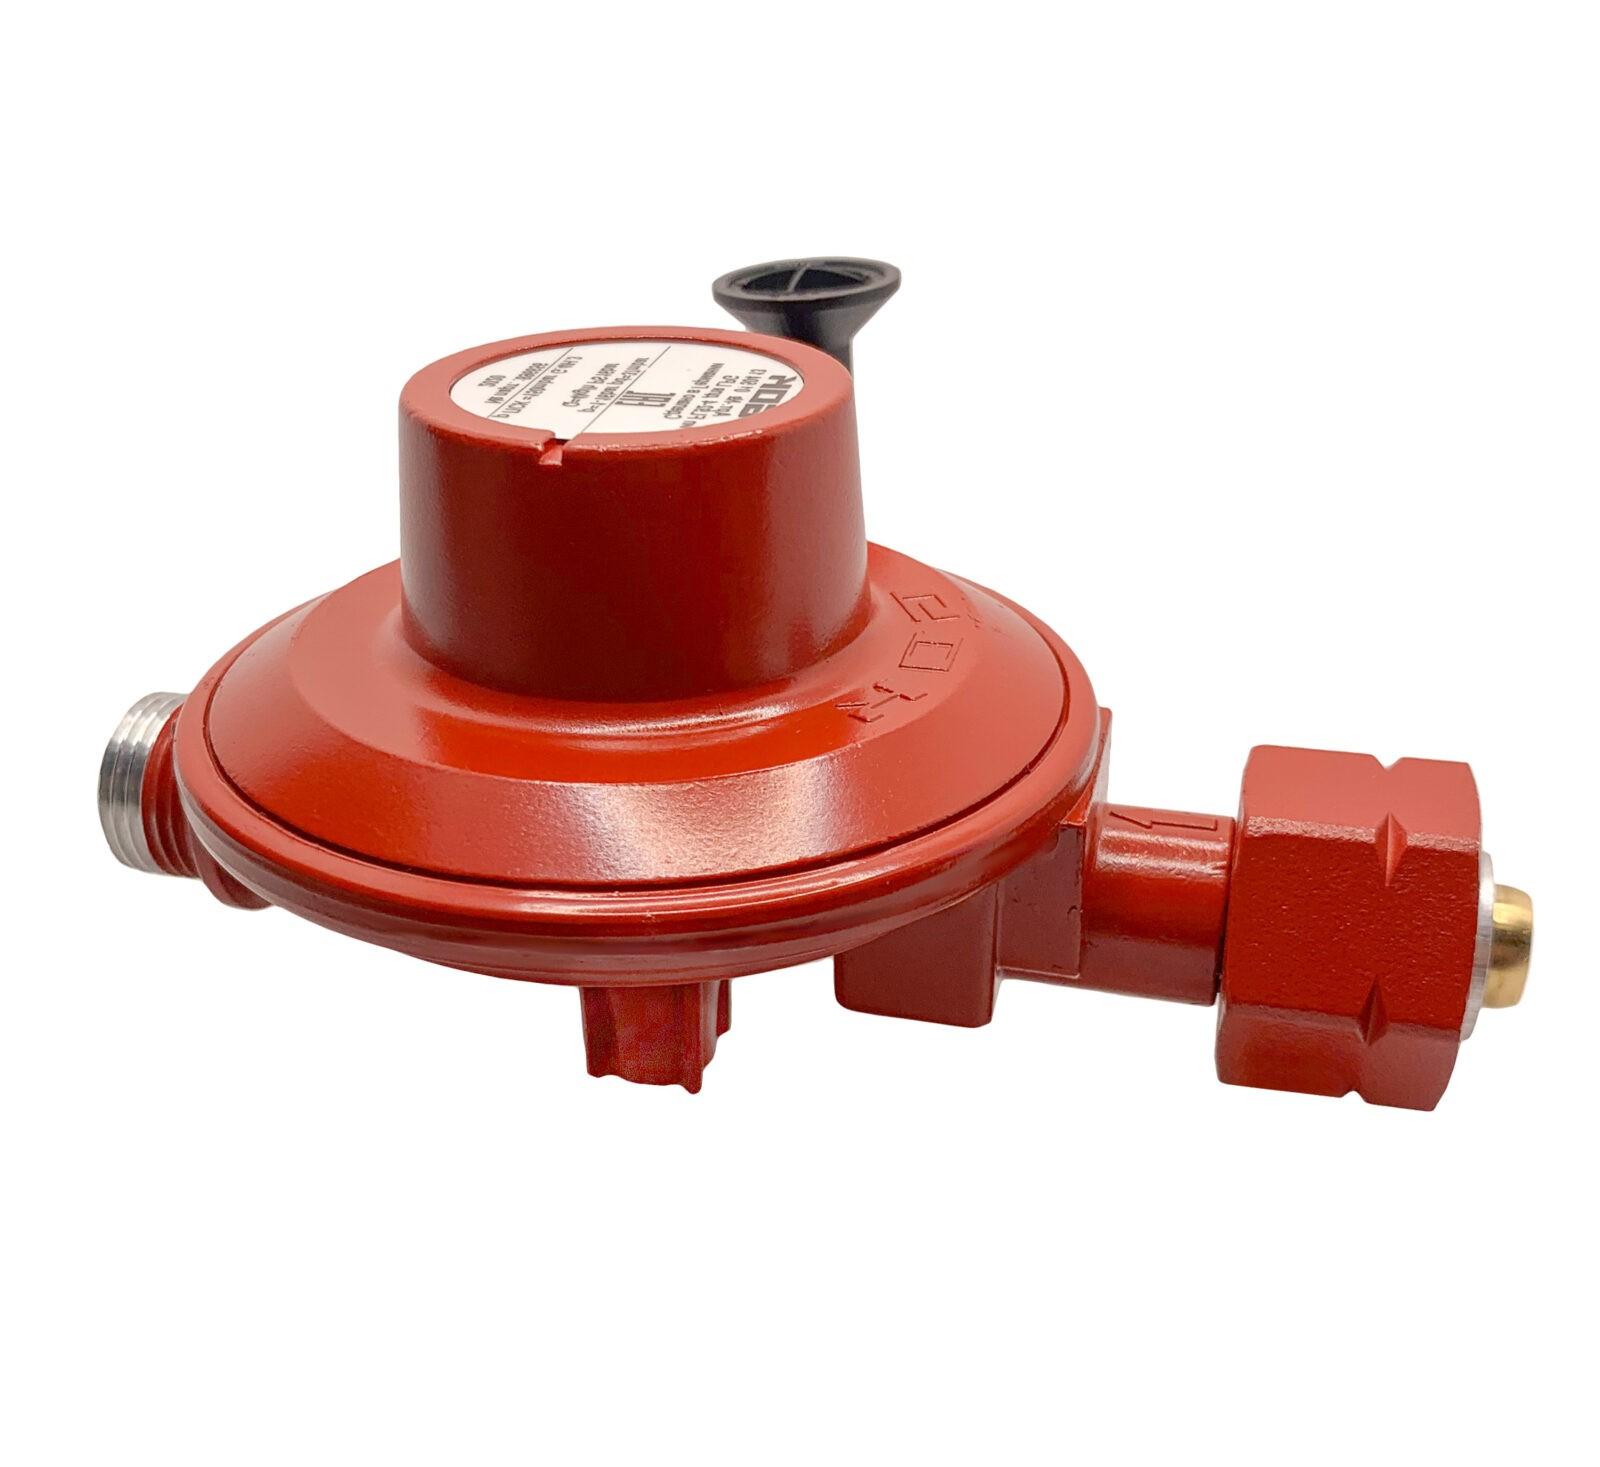 Регулятор давления газа GOK 4 кг/час 37мбар GF x AG G1/2 ПСК